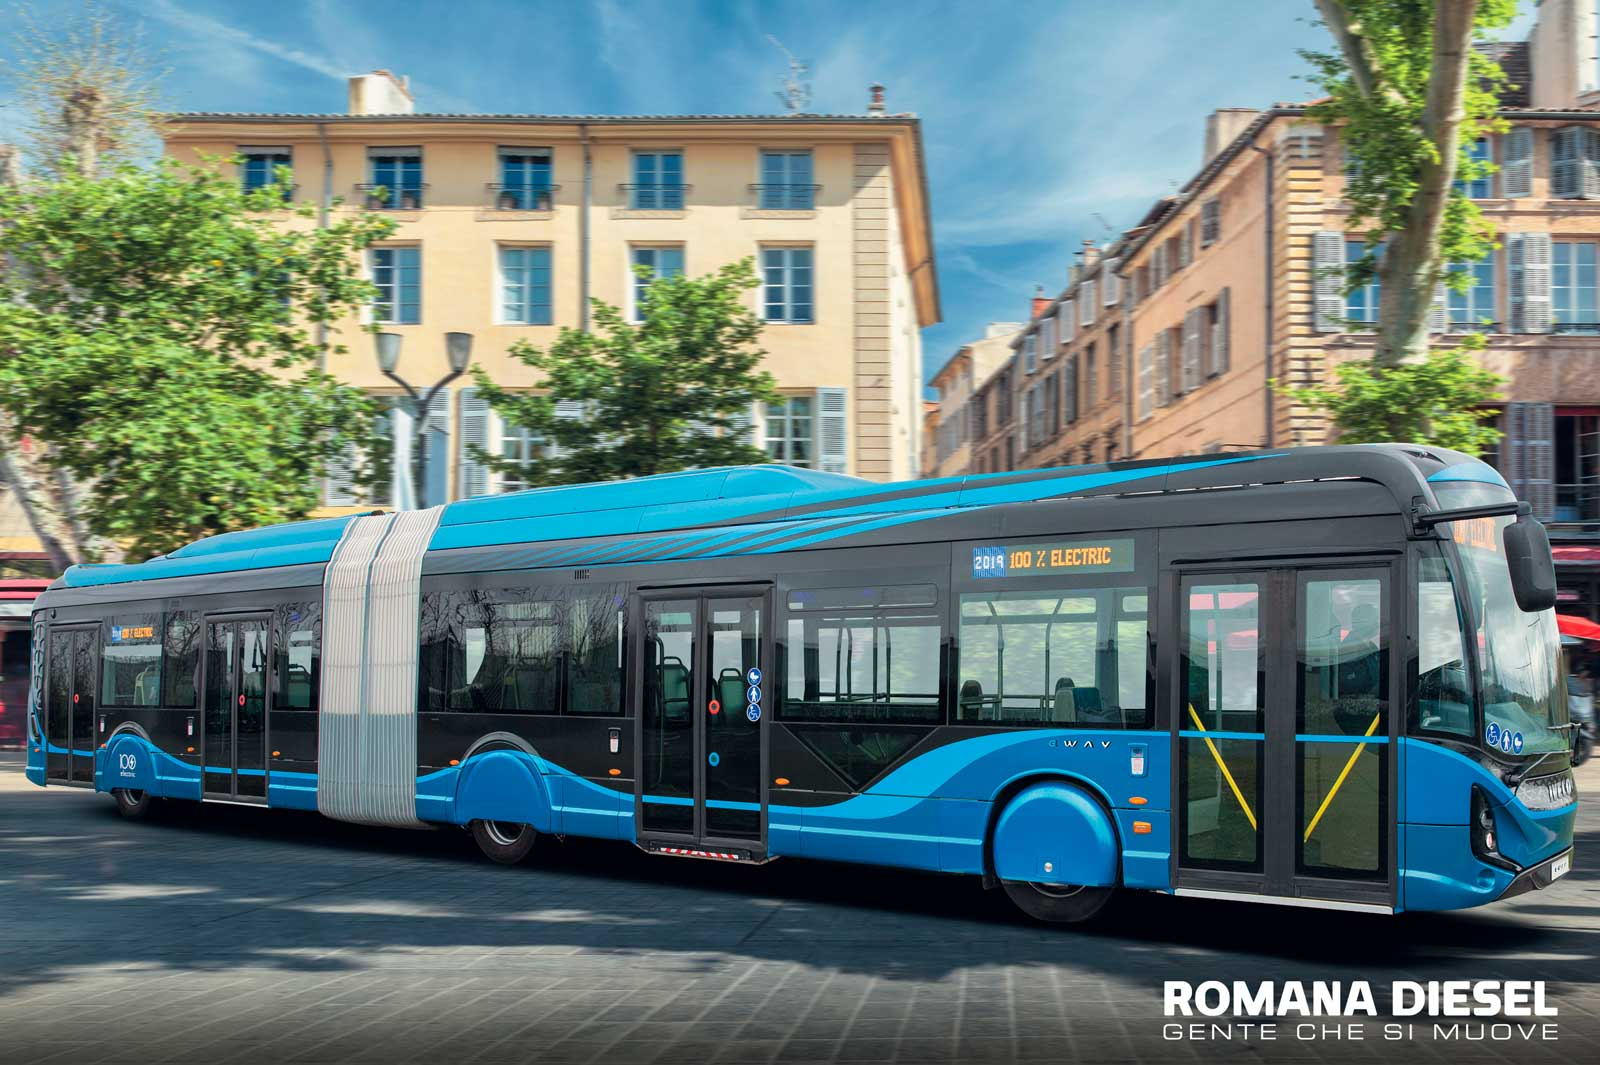 IVECO E-WAY di HEULIEZ autobus elettrico